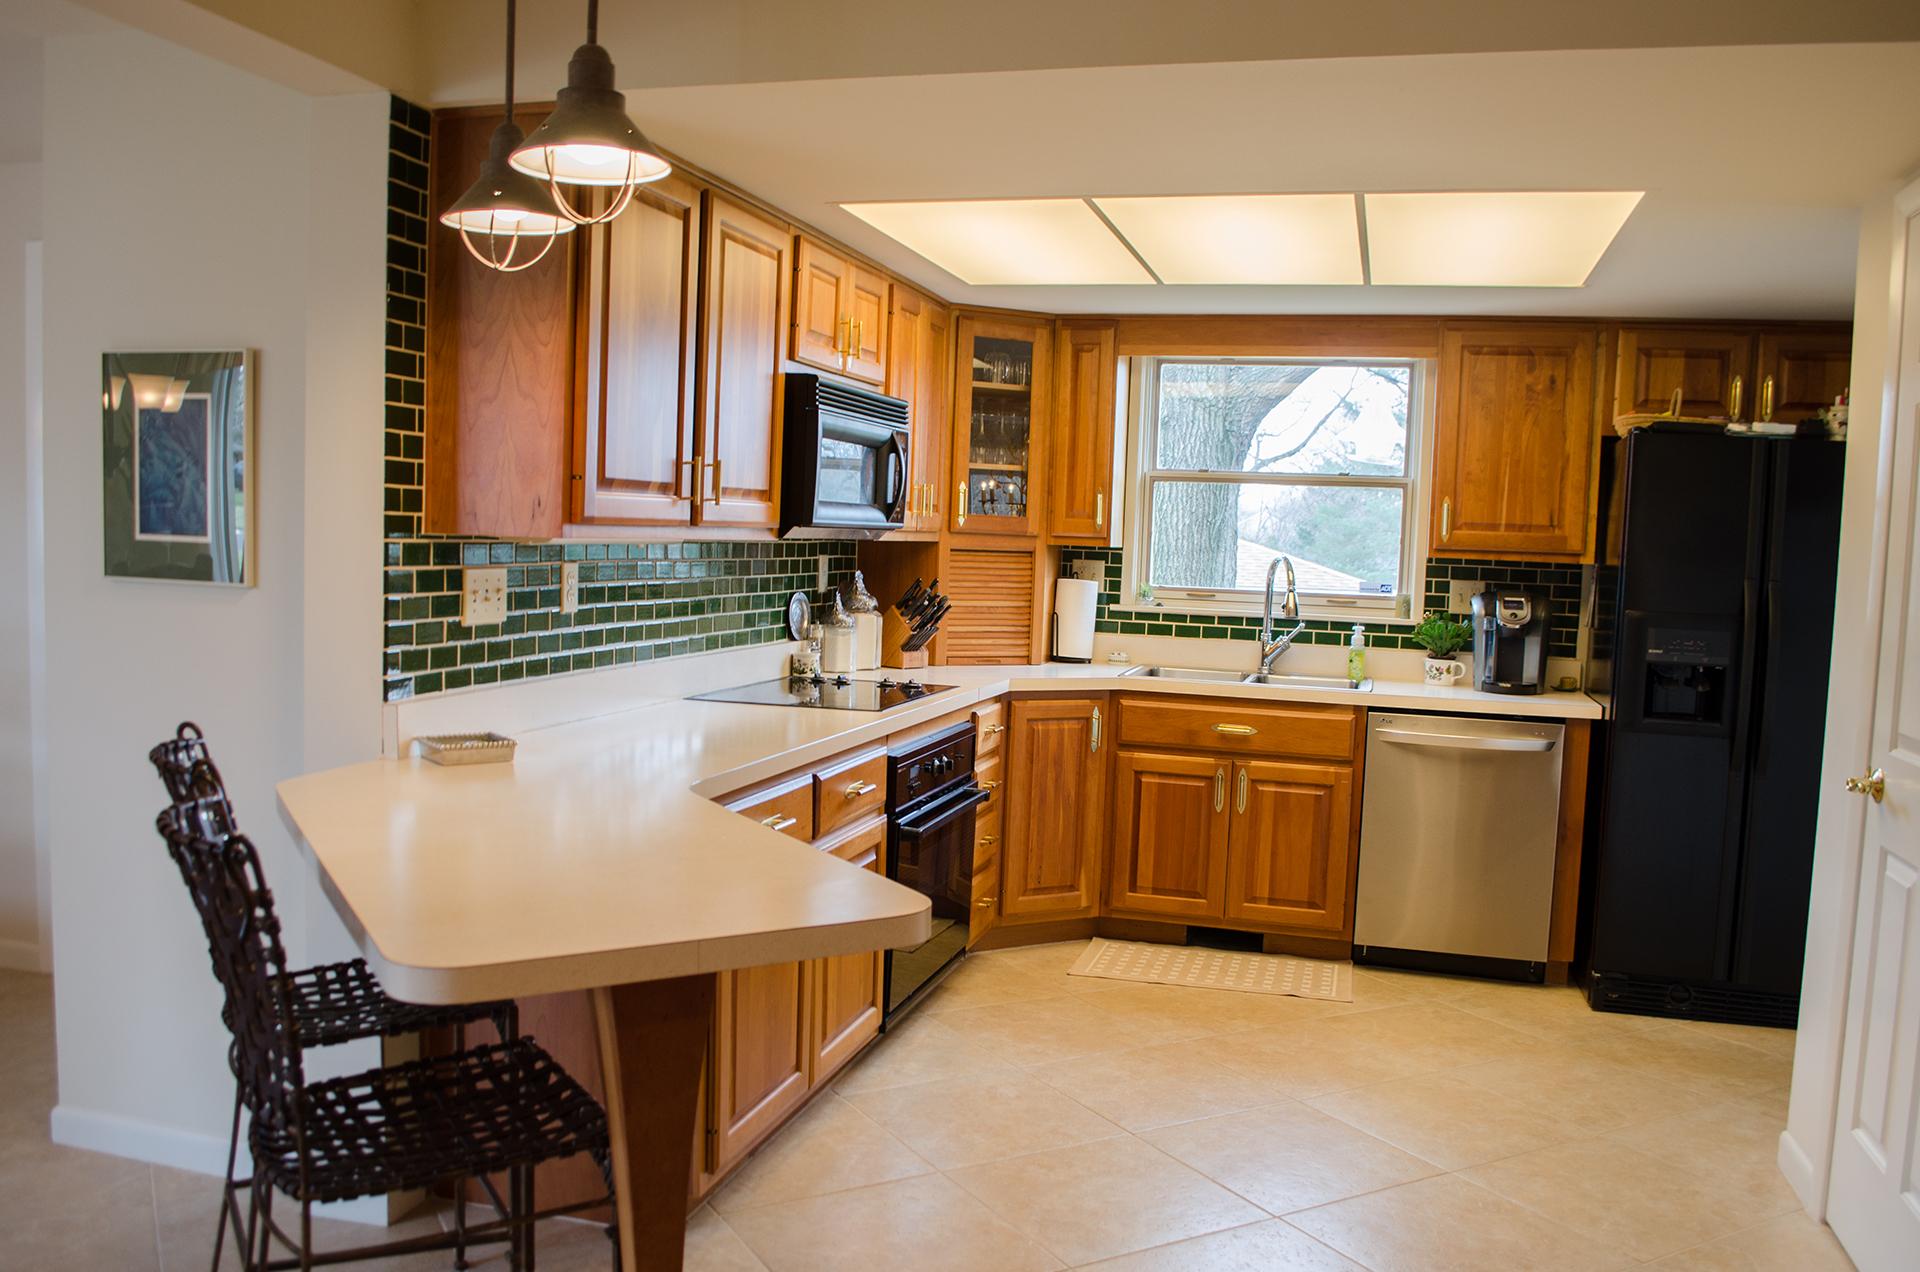 820 Sunnycreek Drive | Dayton, Ohio - Design Homes